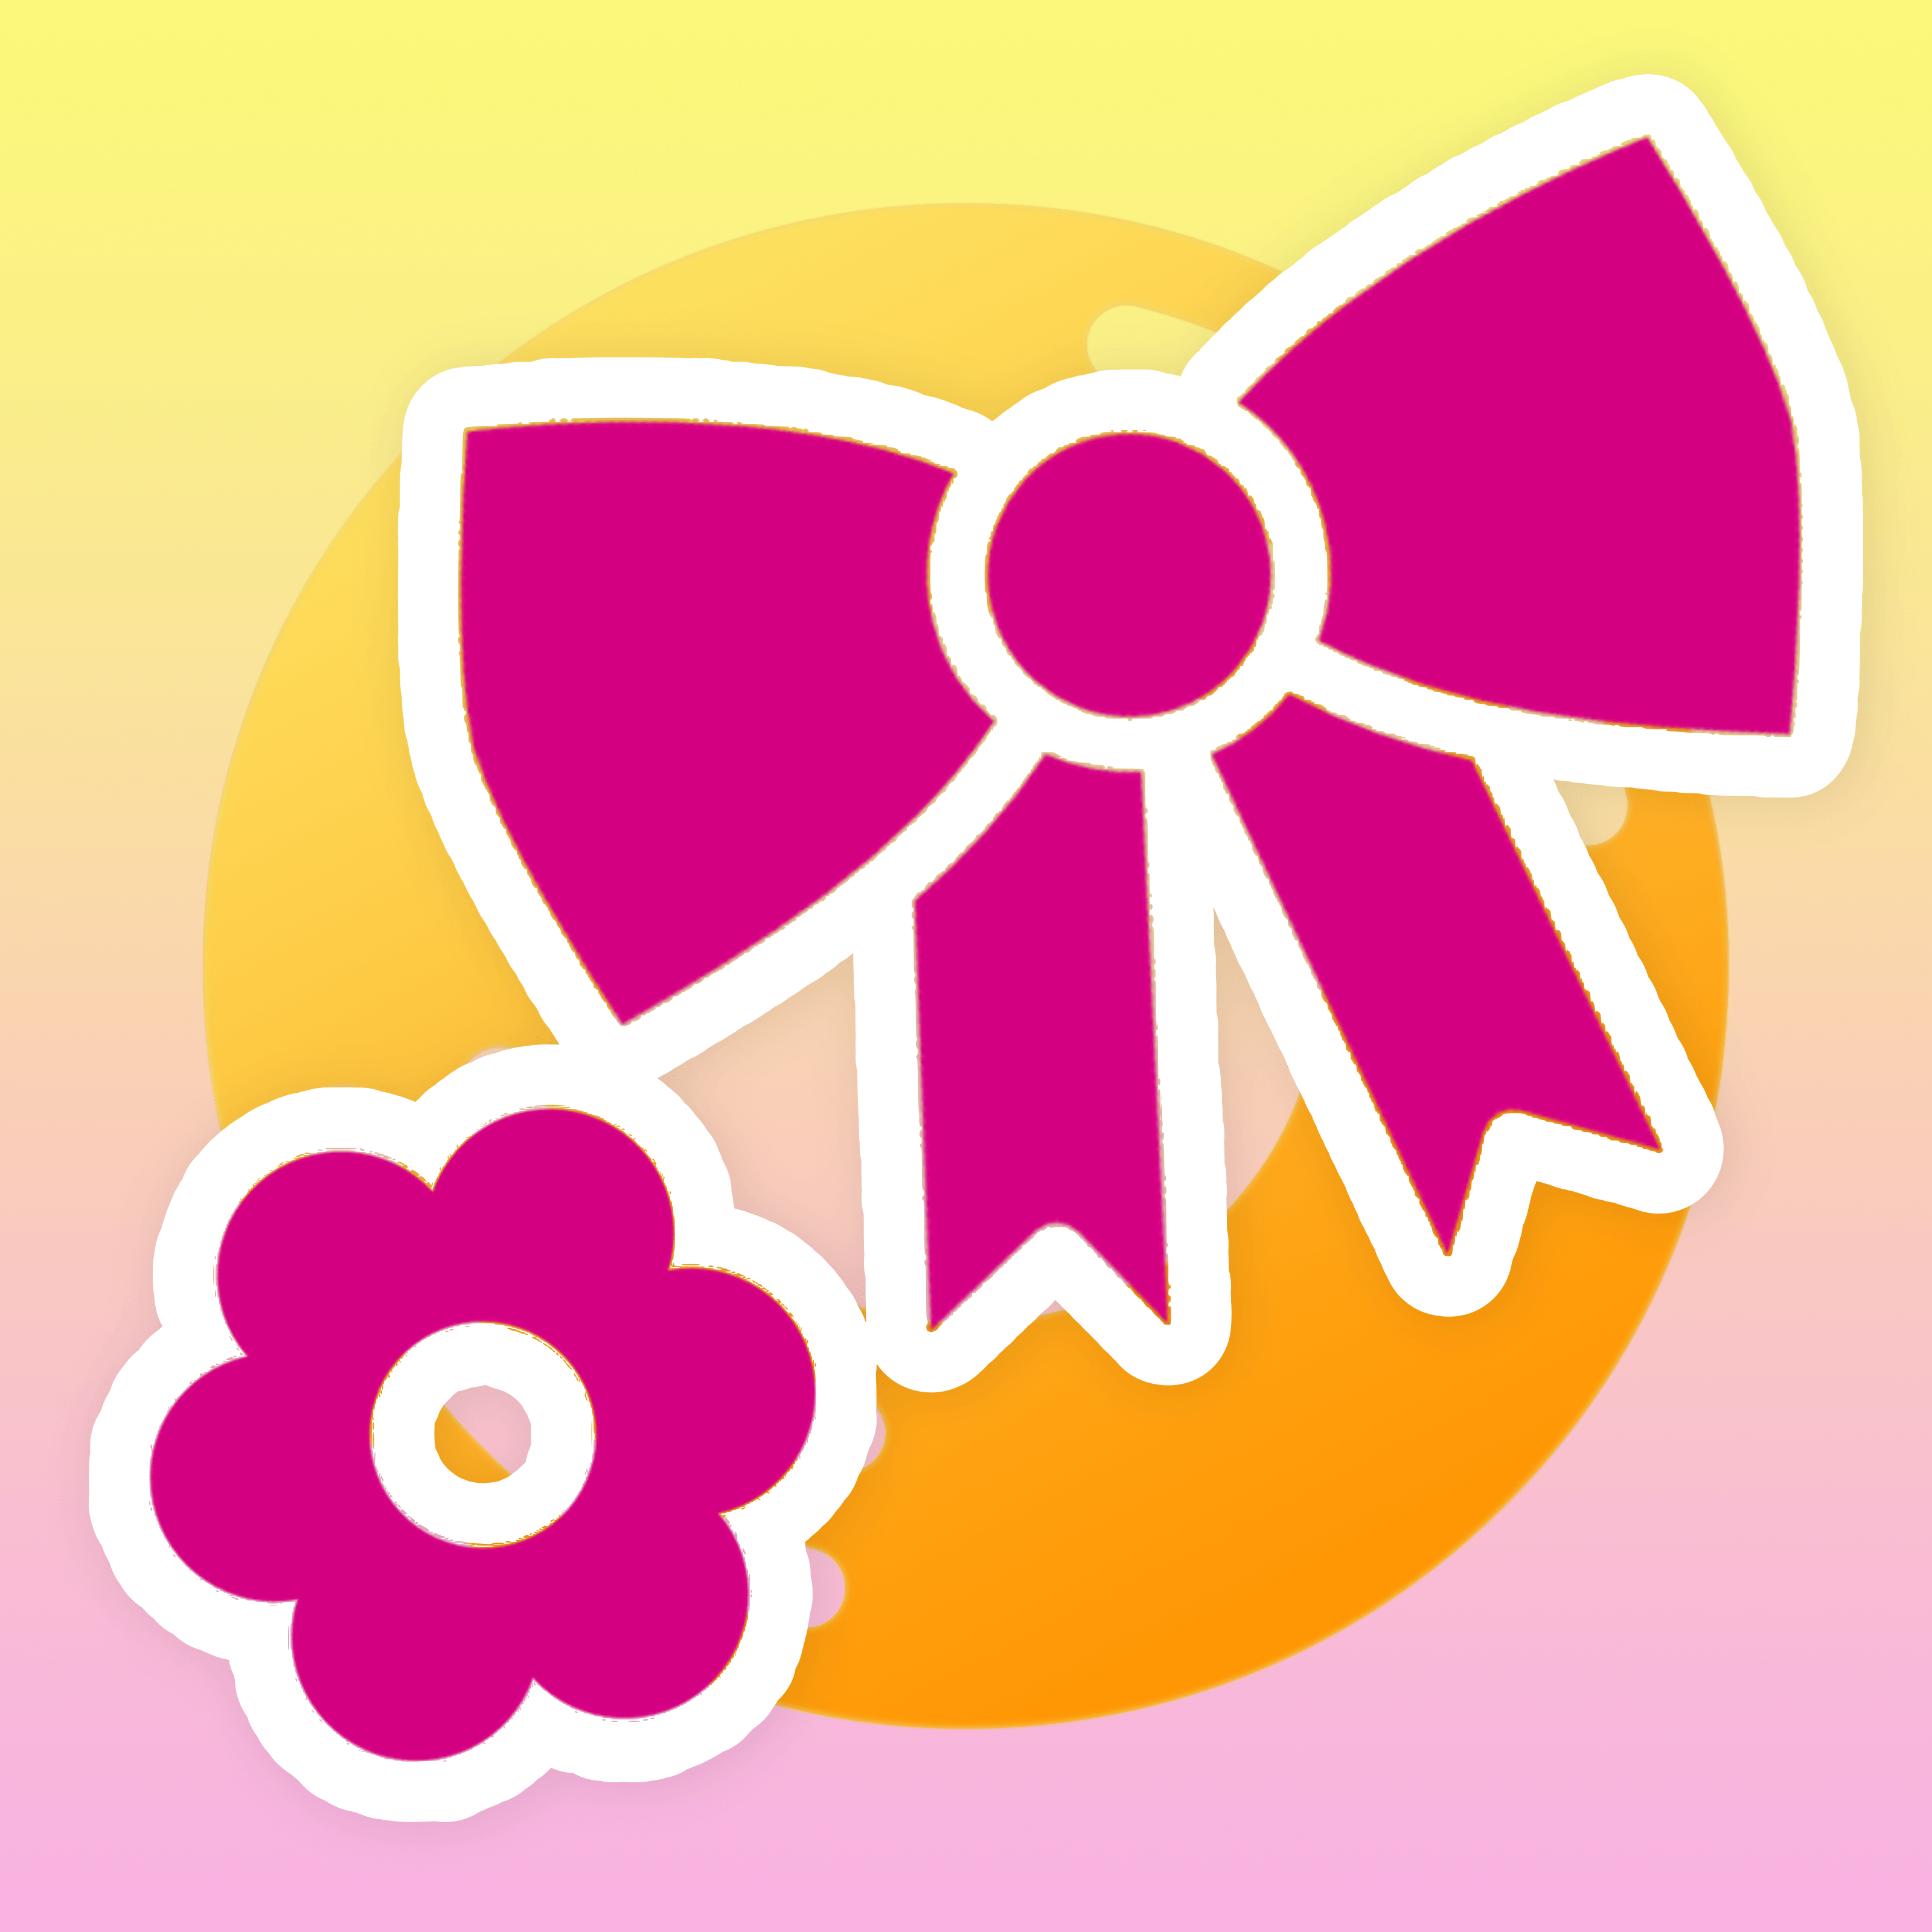 Tranlecon02 avatar